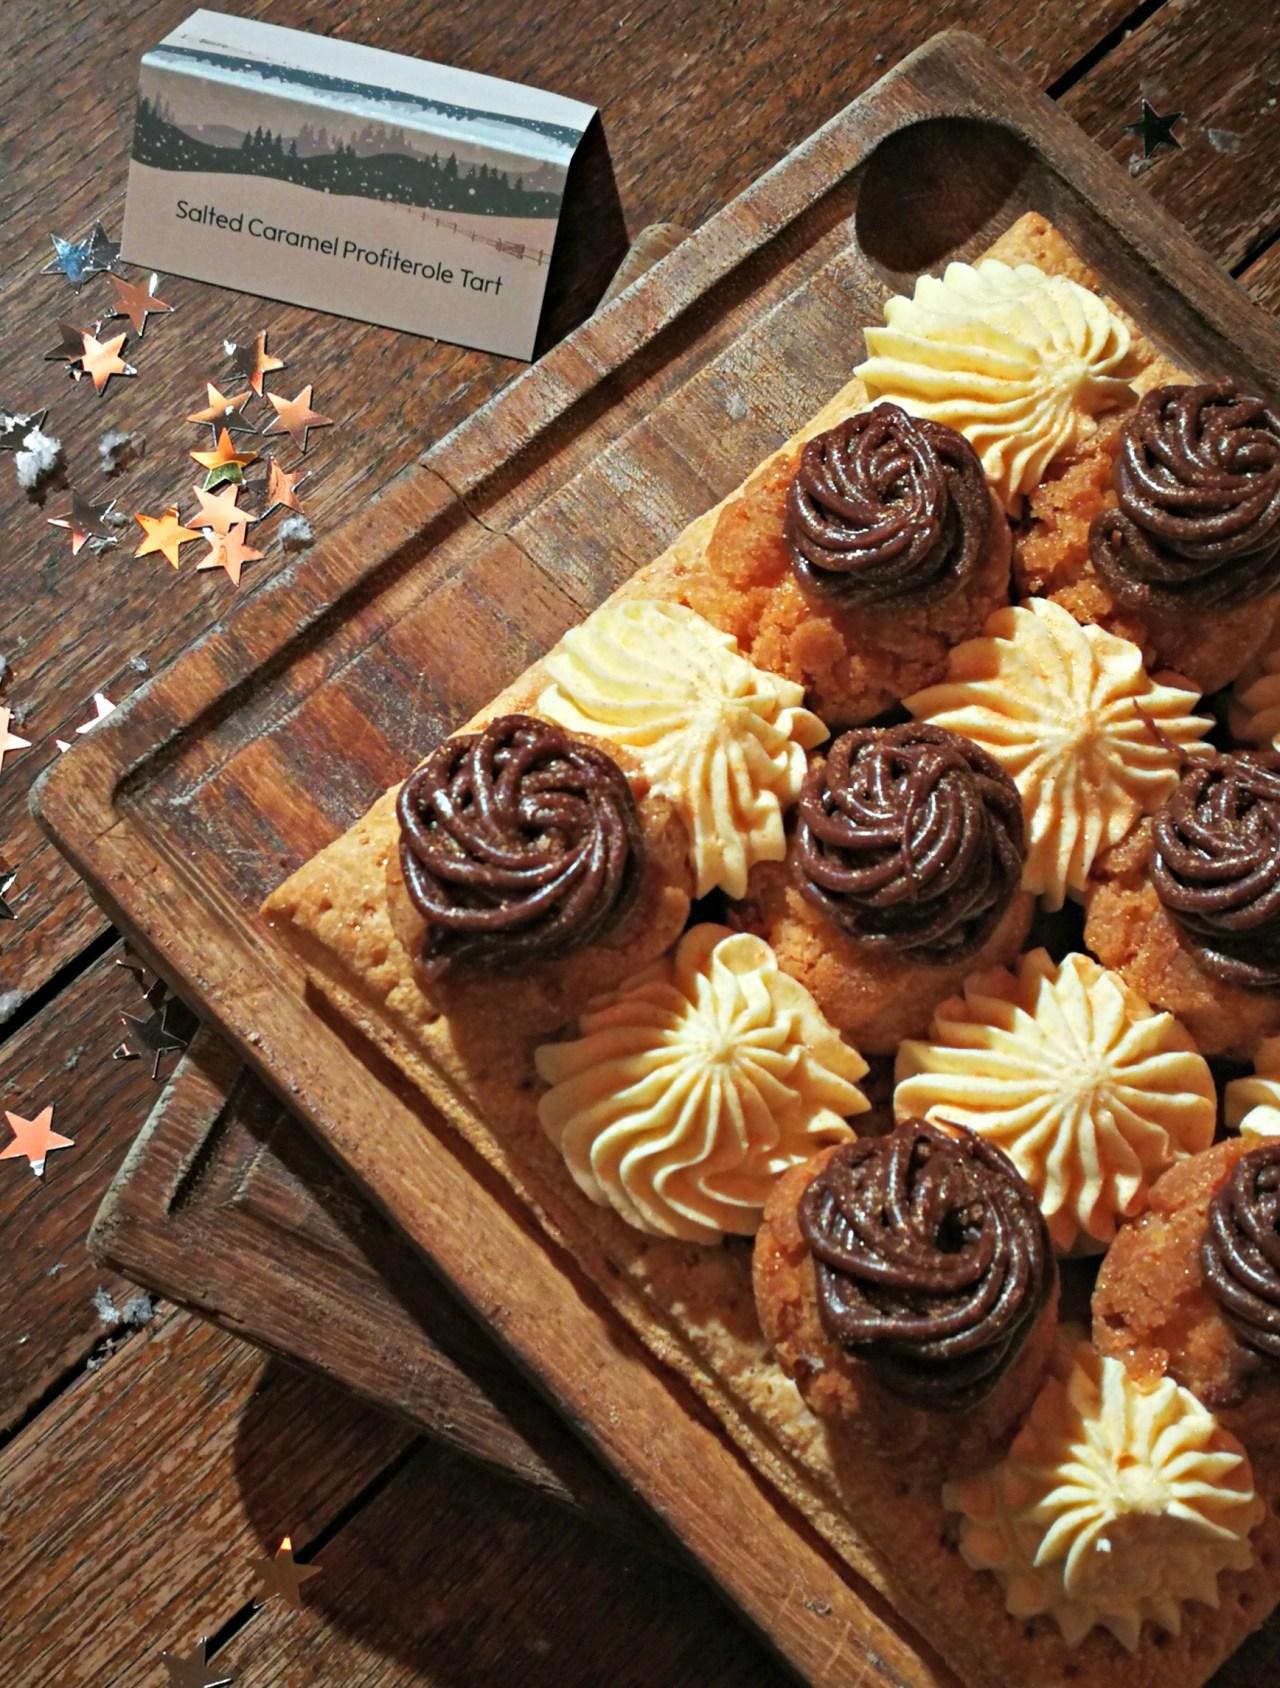 salted caramel profiterole tart